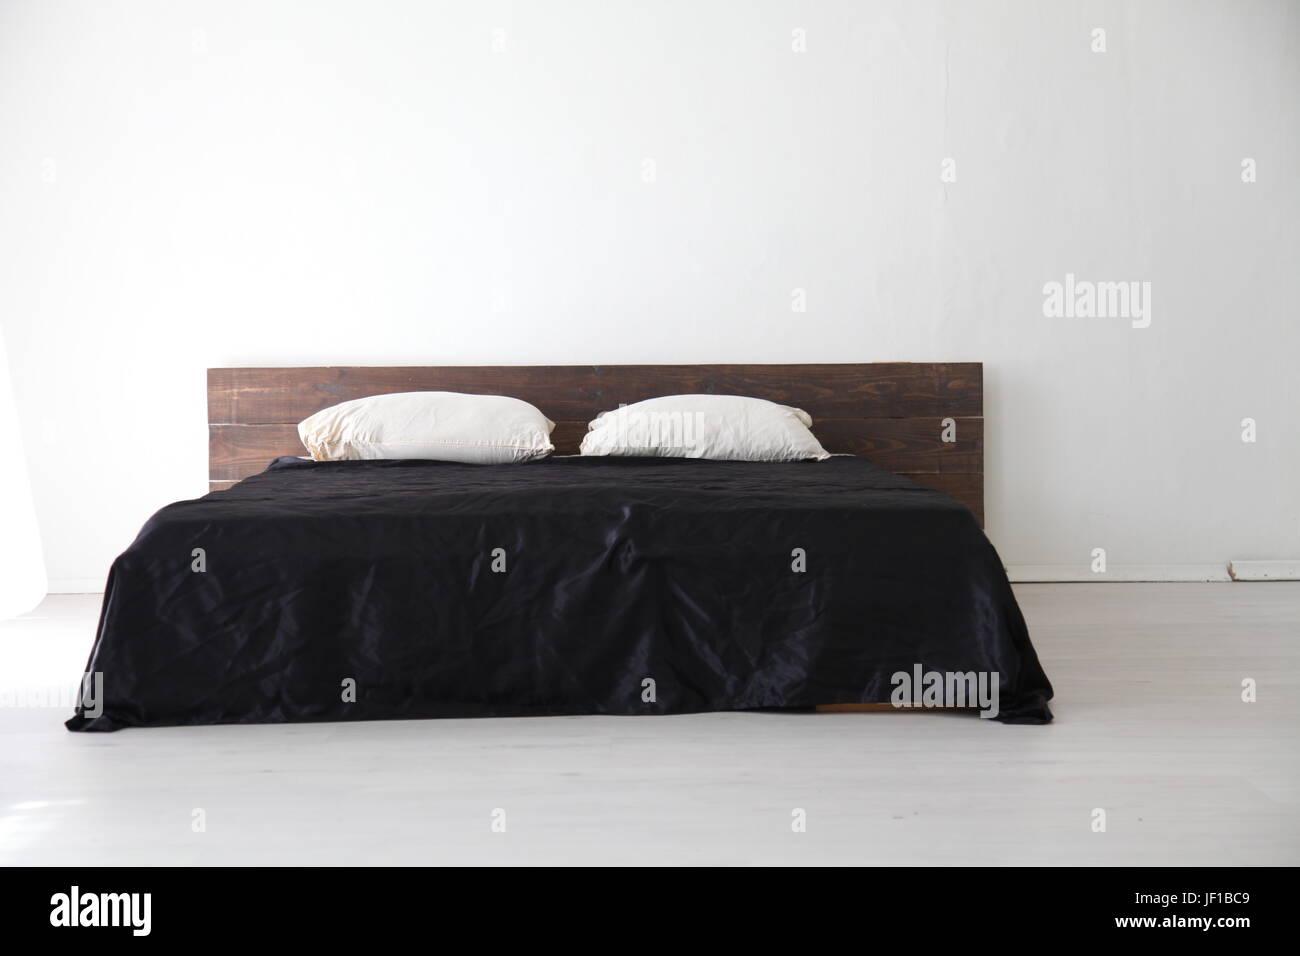 Lenzuola Matrimoniali Stock.Bed Sheets Bedroom Stock Photos Bed Sheets Bedroom Stock Images